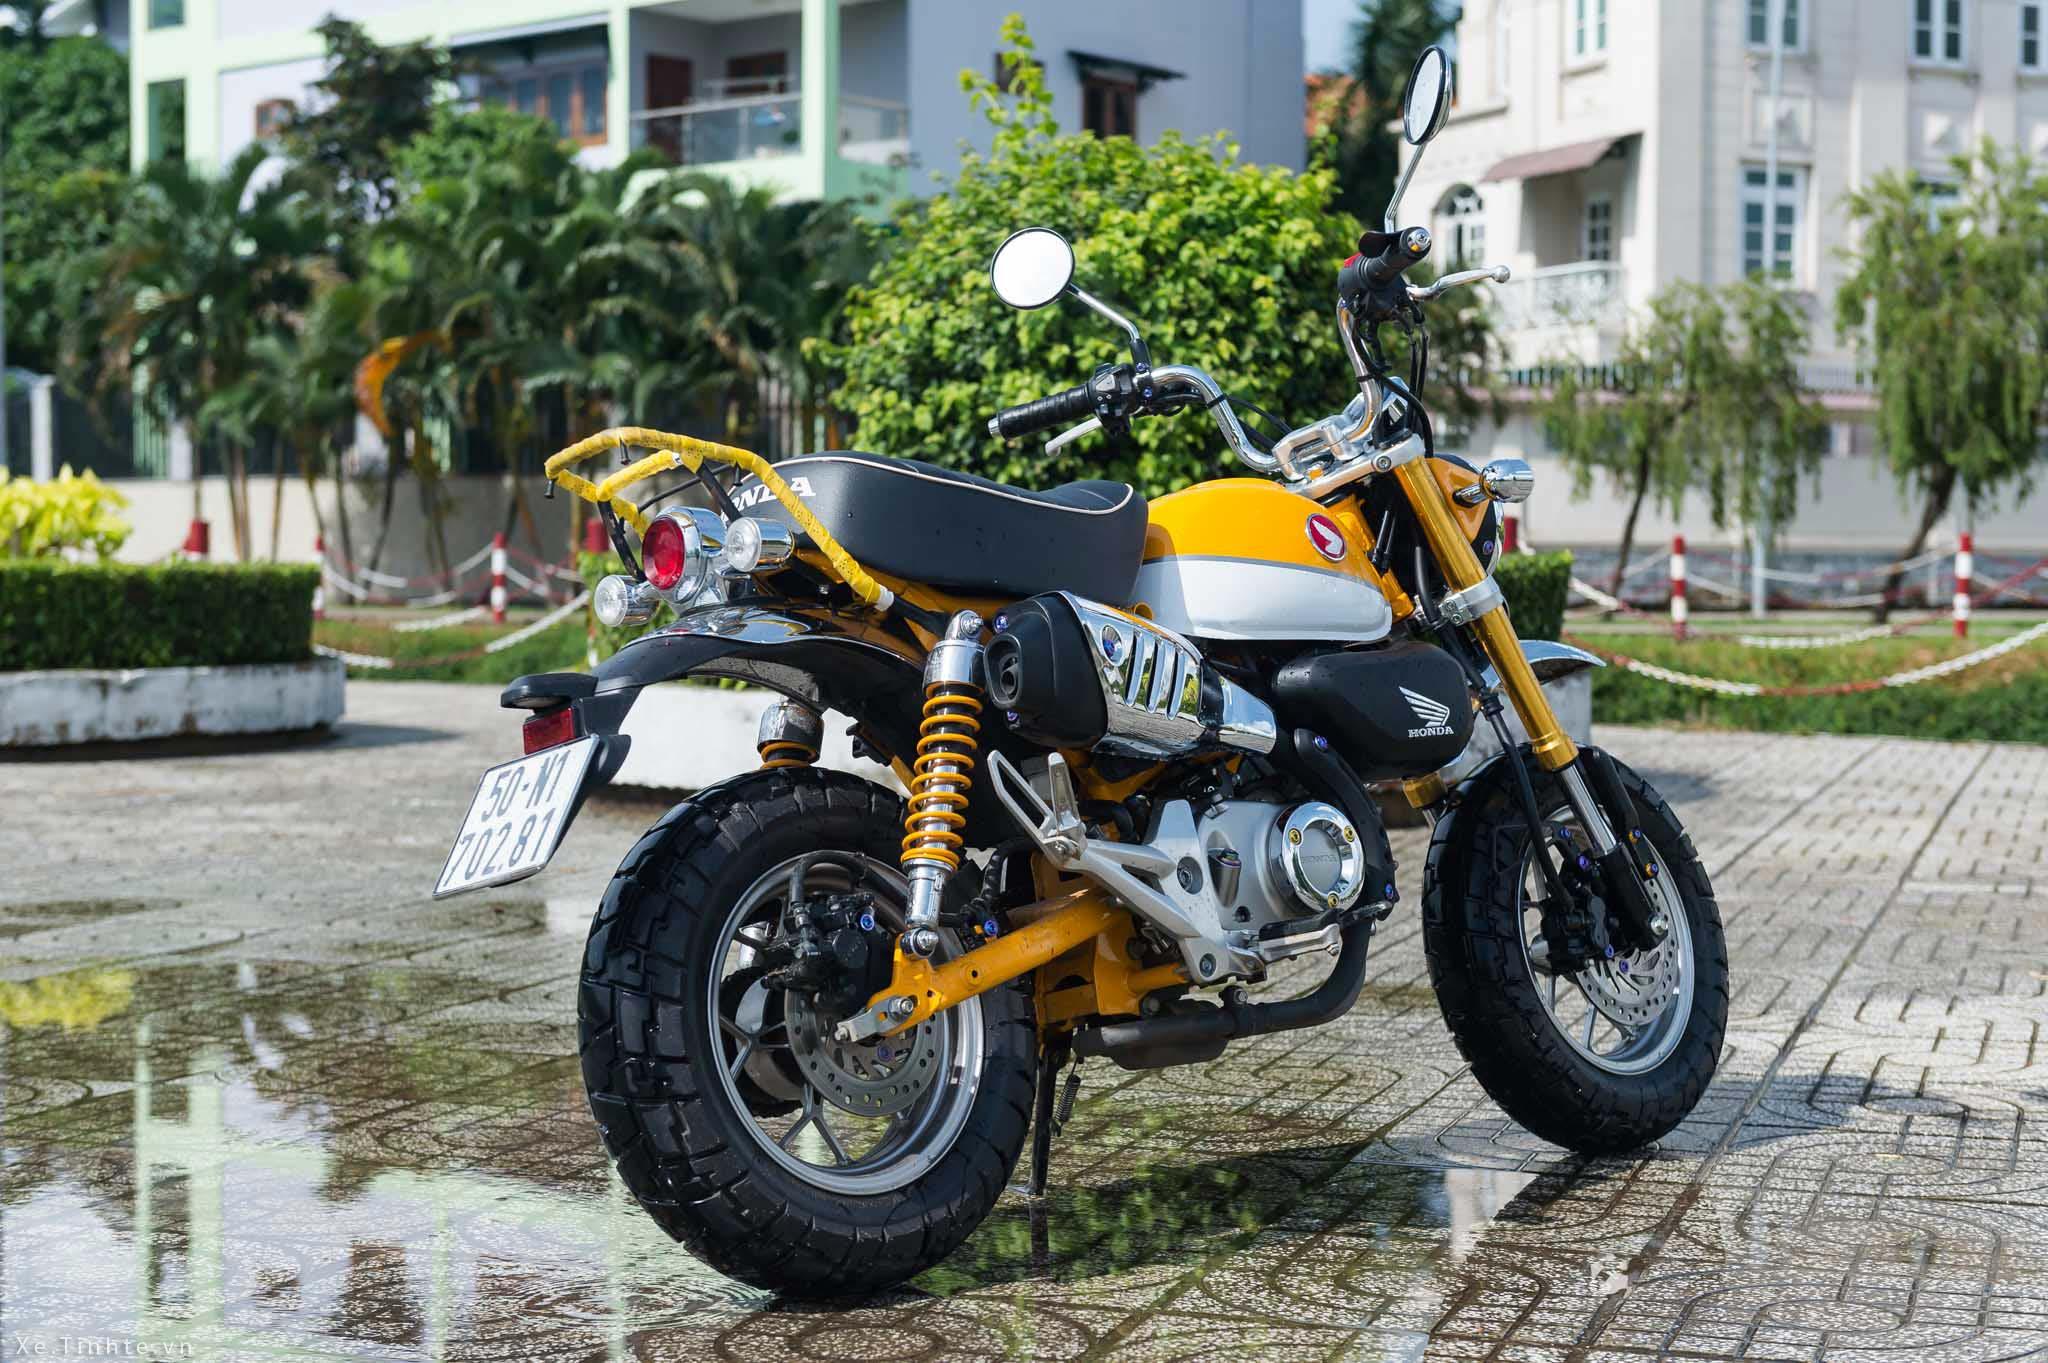 Honda_Monkey_125_Xe_Tinhte (11).jpg